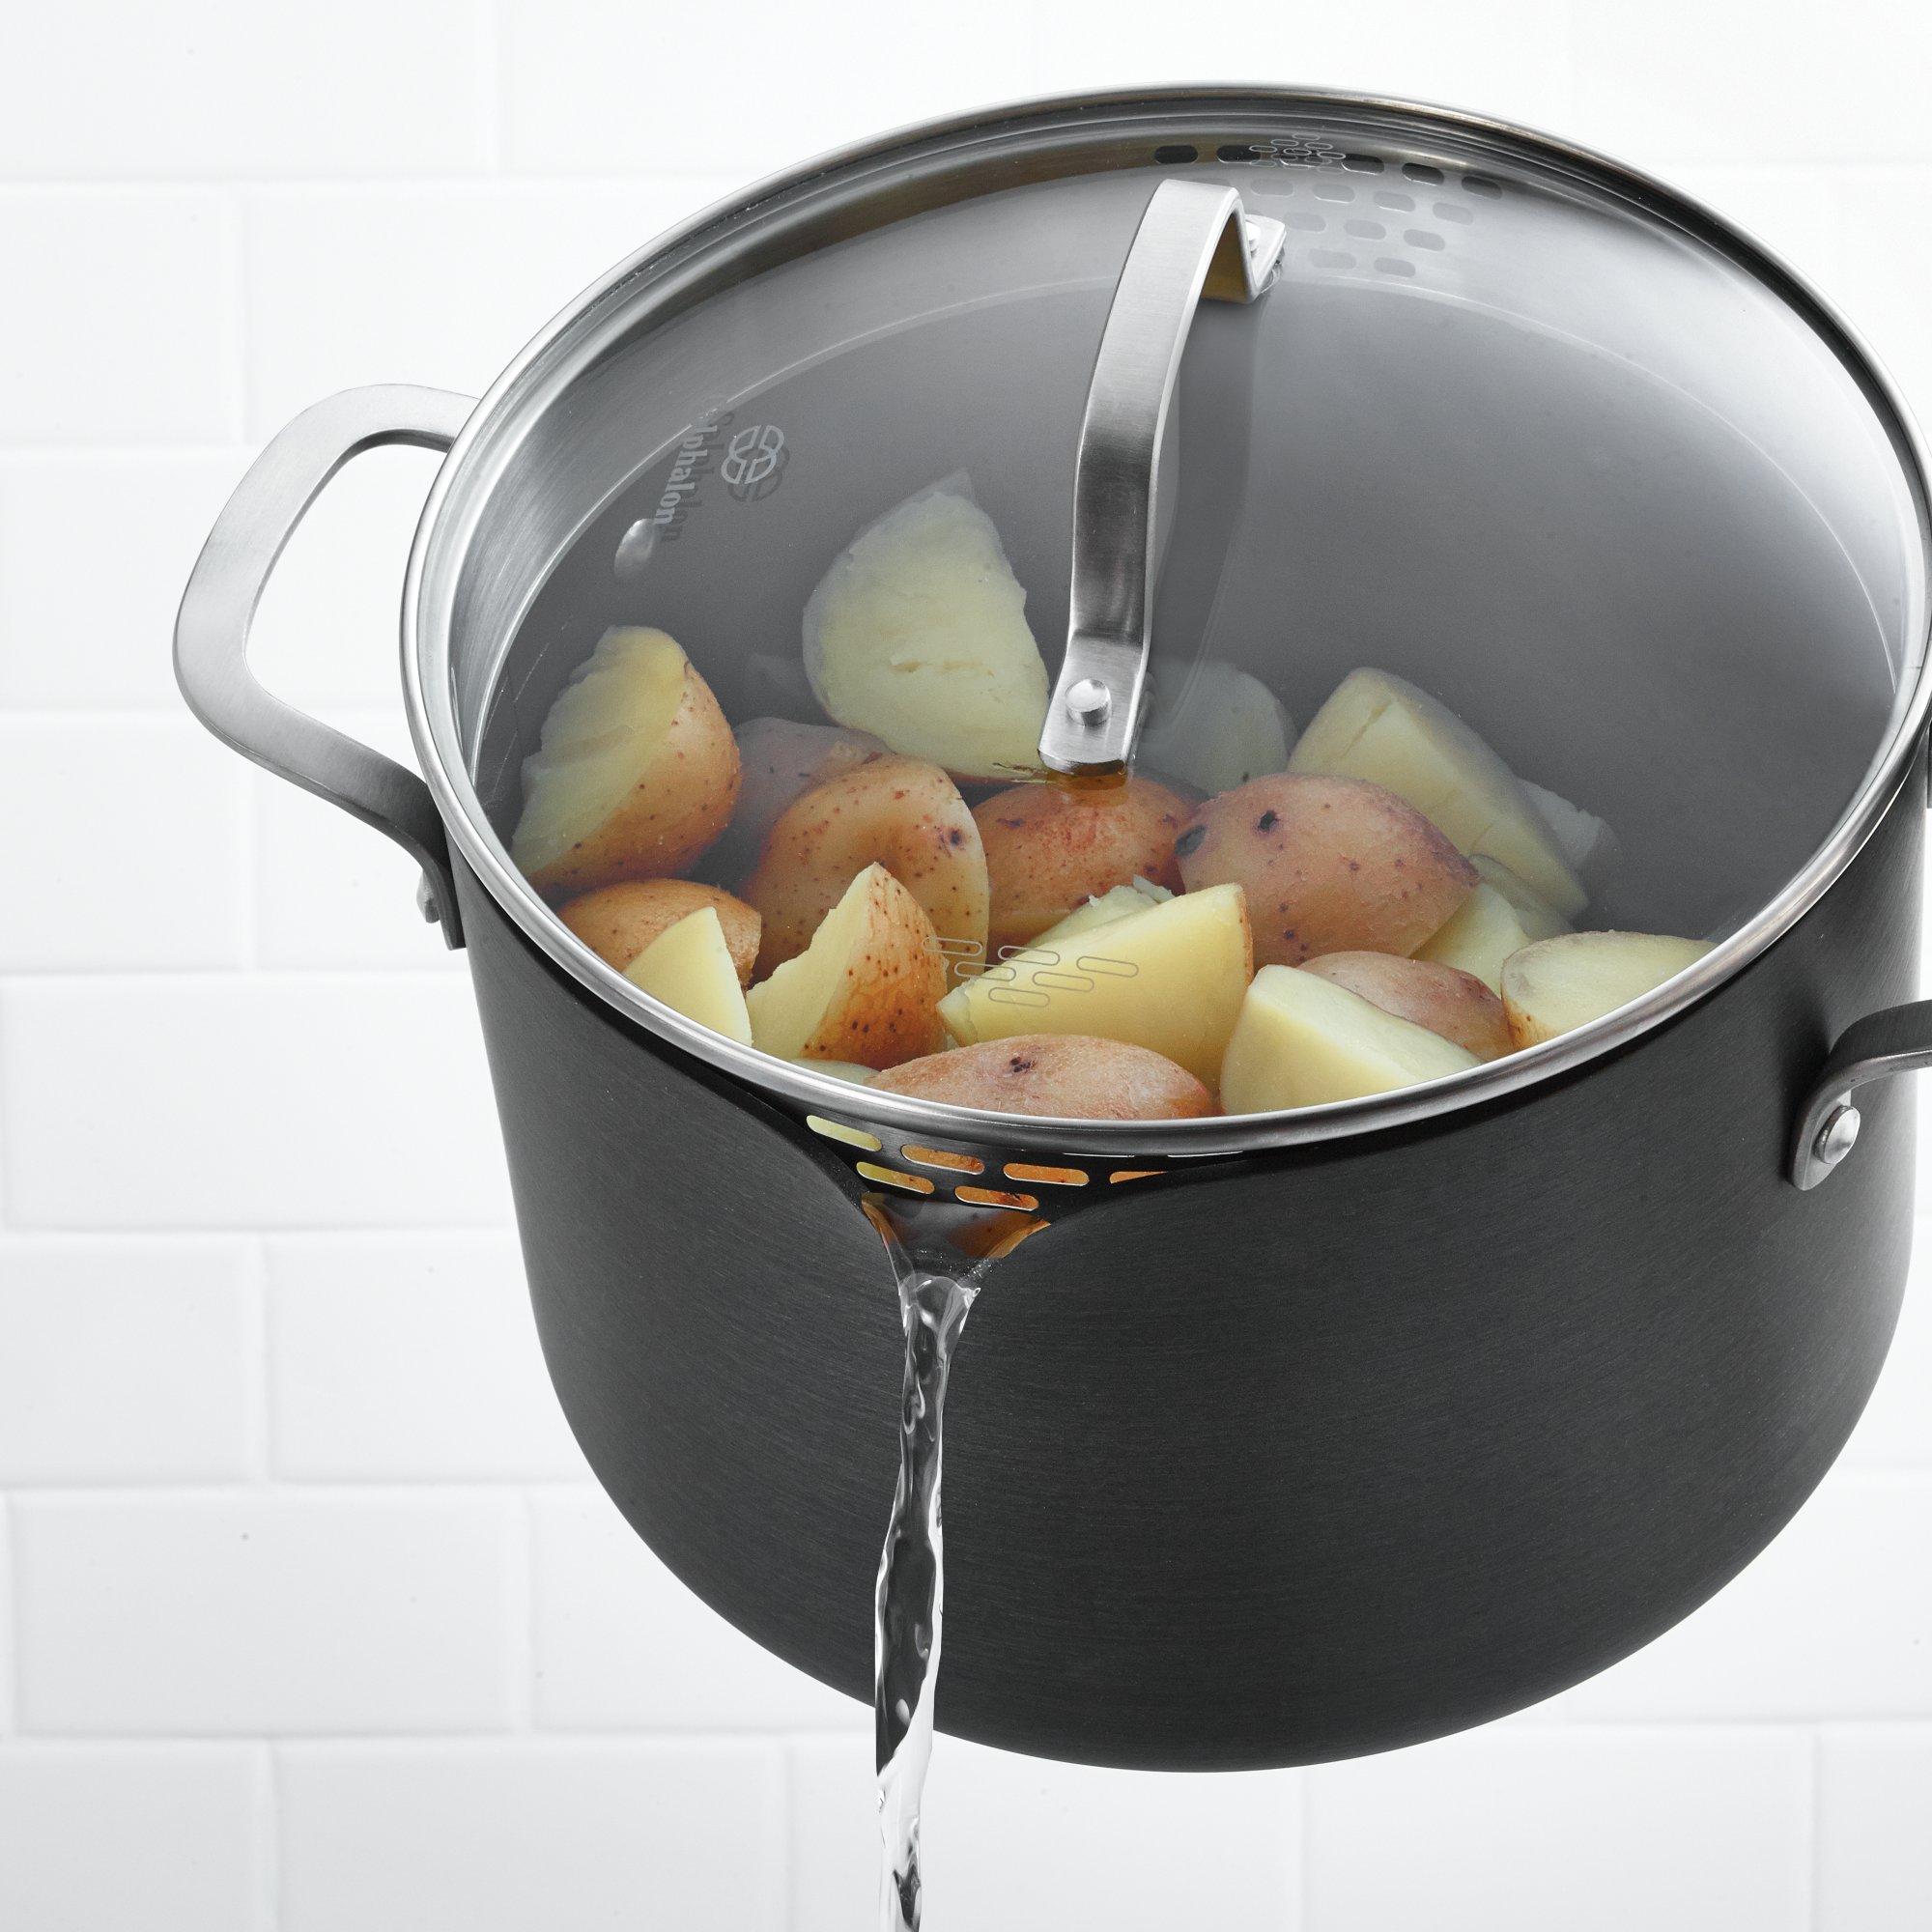 Calphalon Classic Nonstick 10 Pc Cookware Set